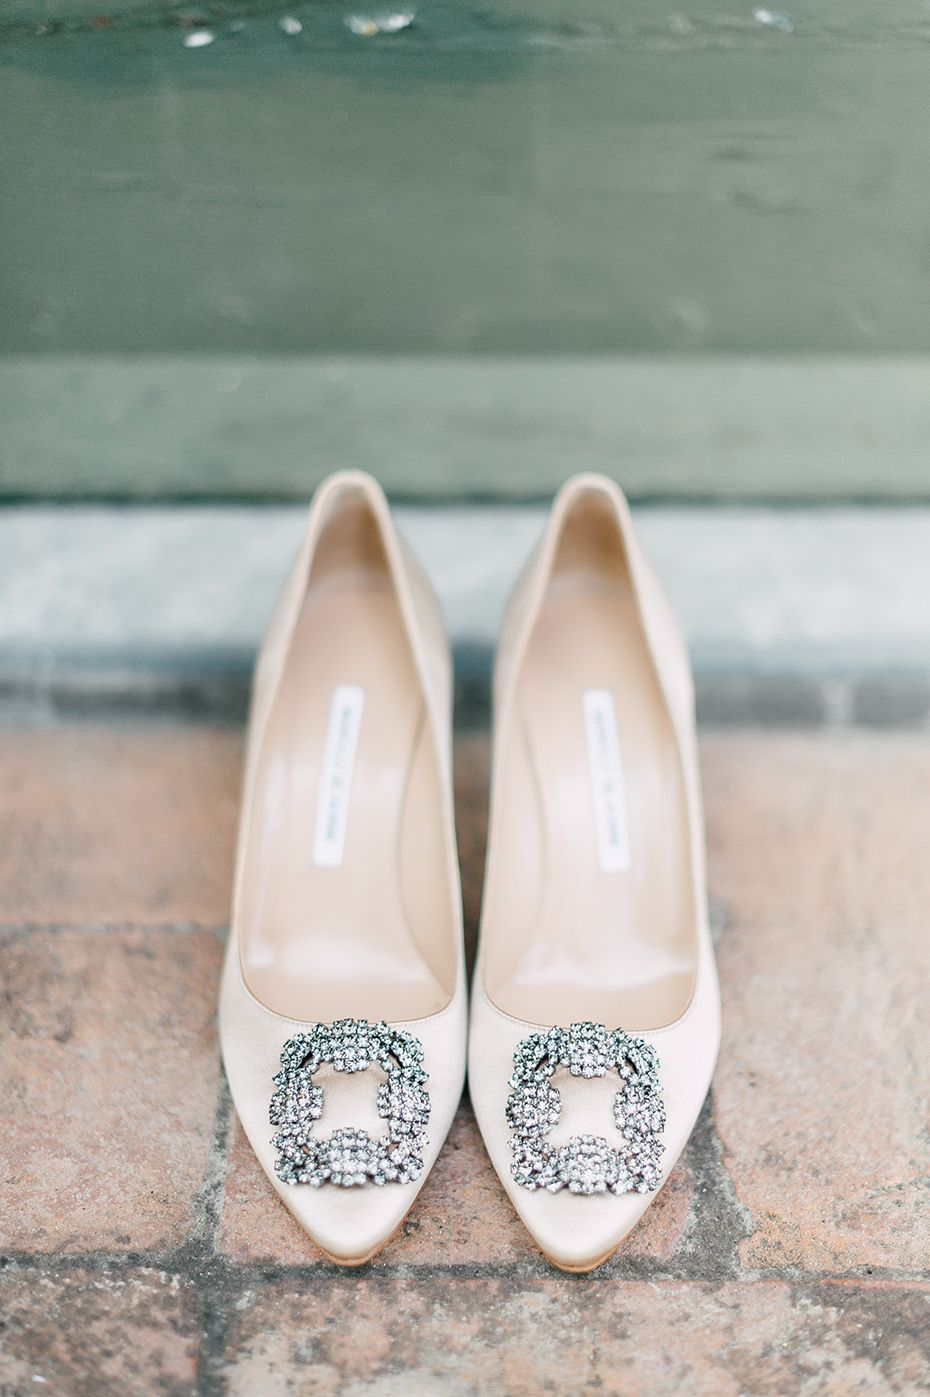 Wedding Shoes Bridal Shoes Buty Slubne Wedding Day Slub Panna Mloda Slub Wlochy Bridal Details Dodatki Slub Piekne Wedding Shoe Shoes Fashion